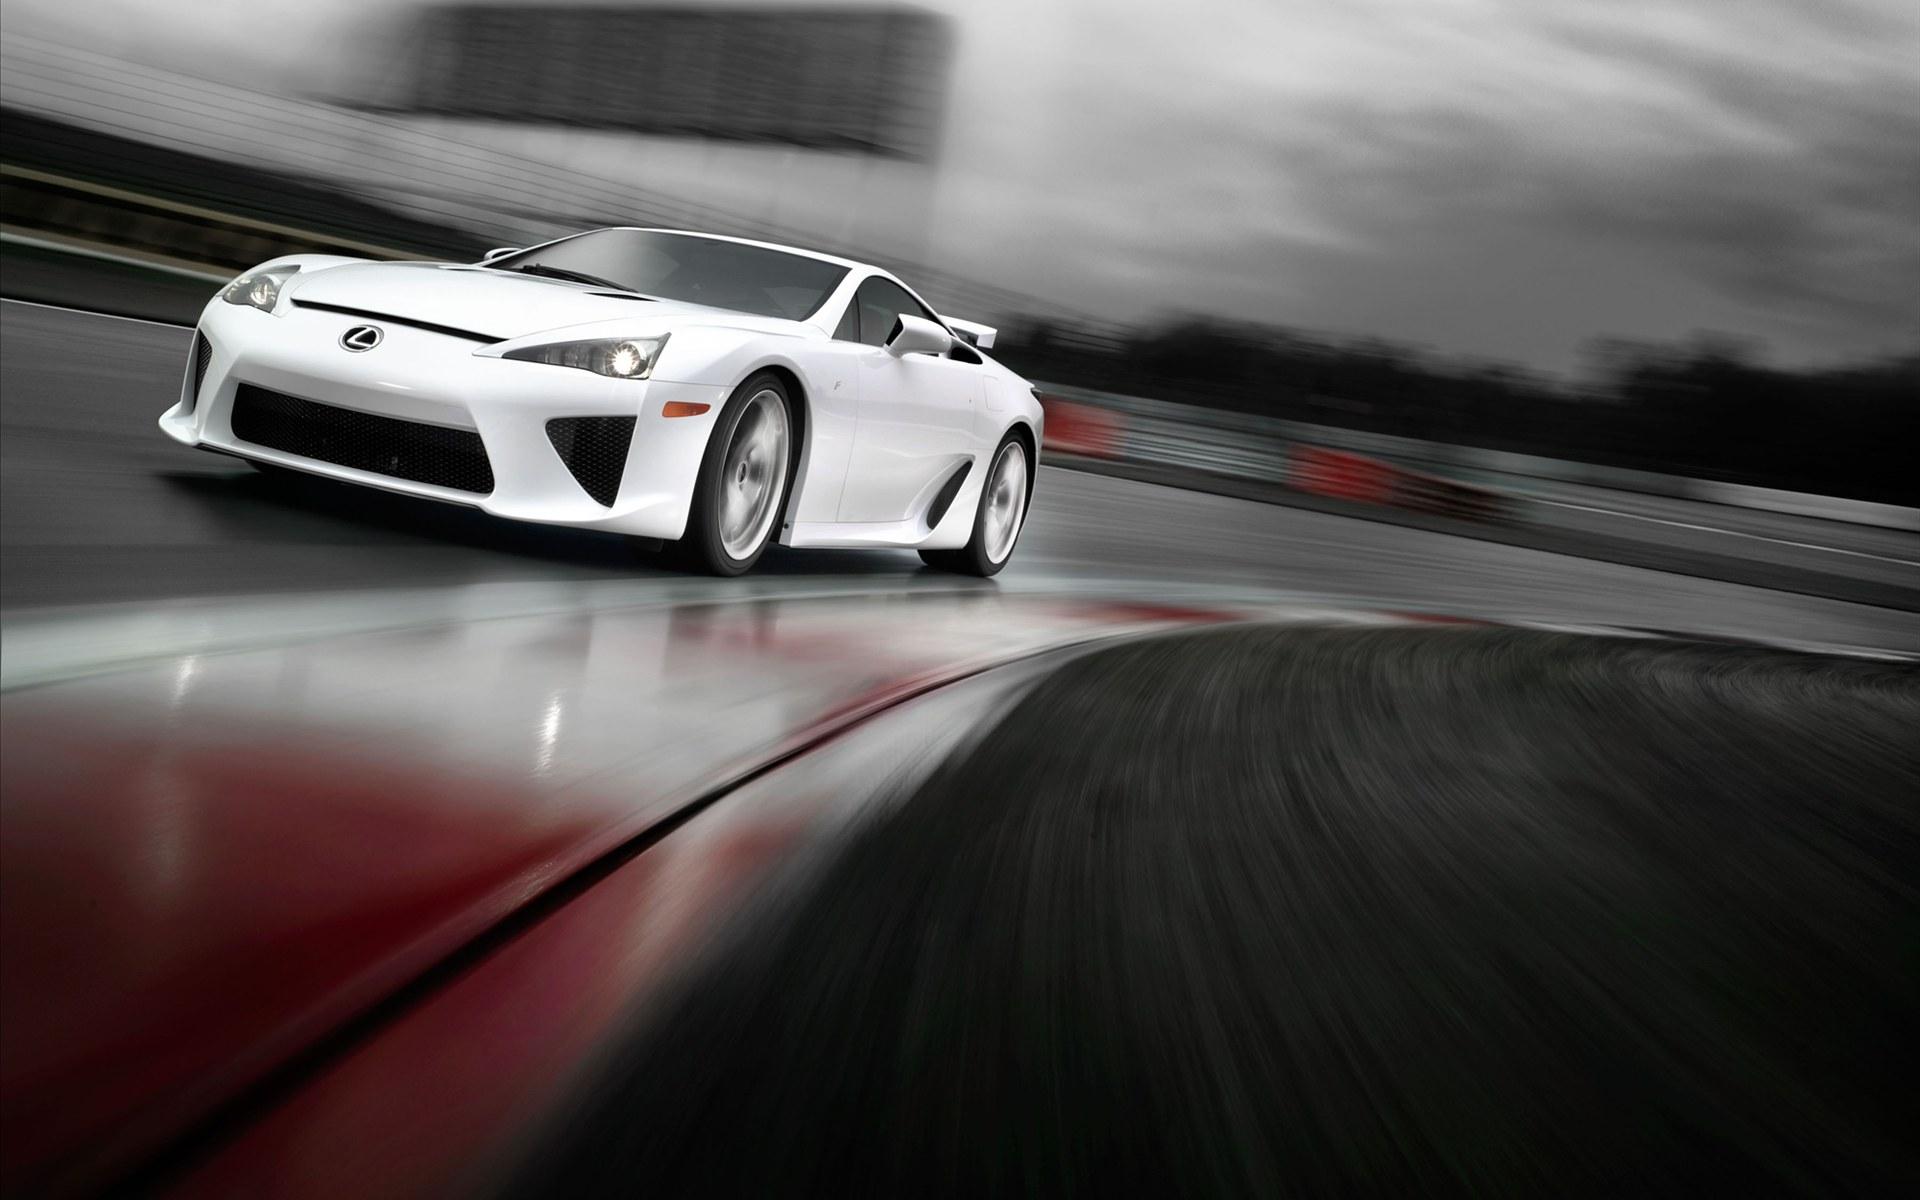 Lexus Lfa Wallpapers Pictures Images